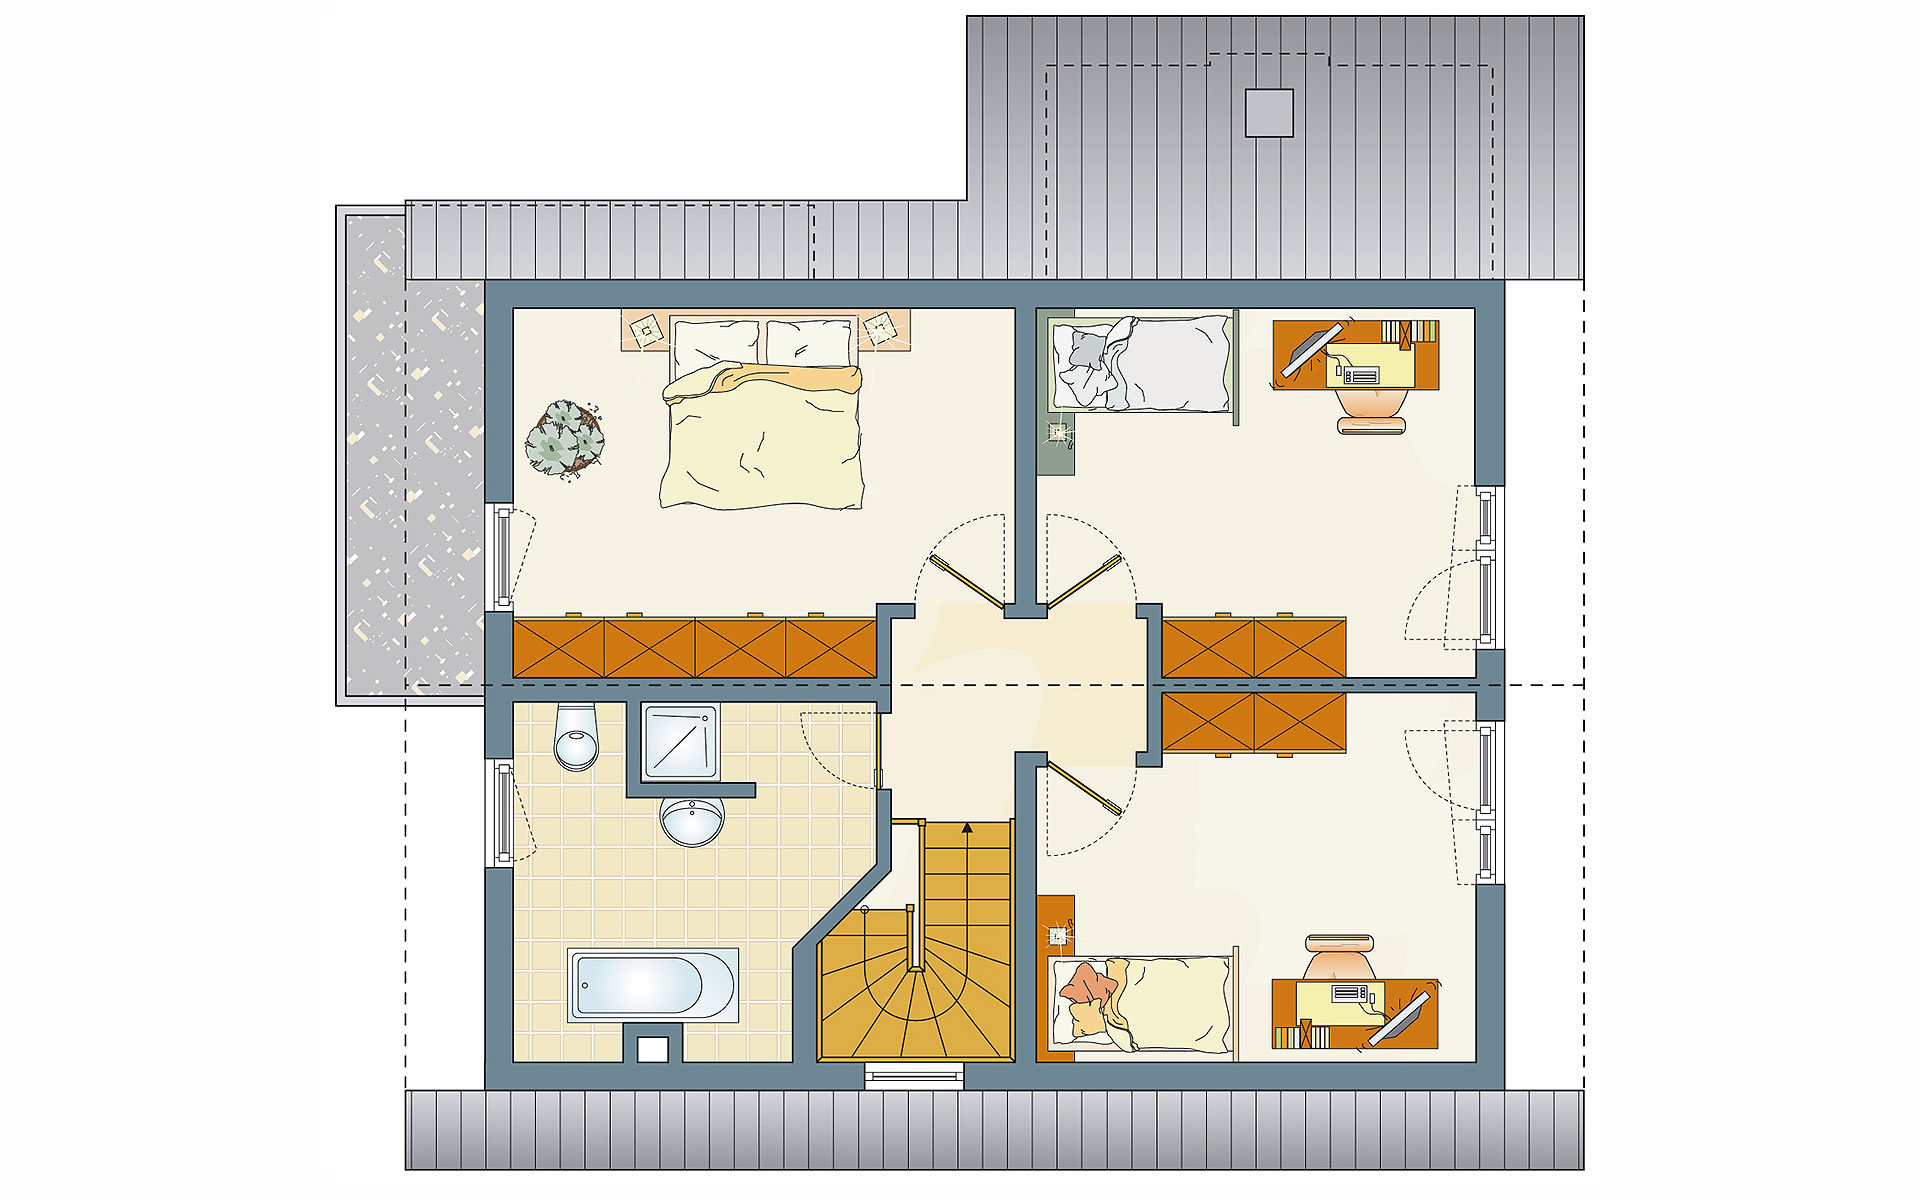 Dachgeschoss Frei geplant - FLAIRplus - MH Marburg von FingerHaus GmbH